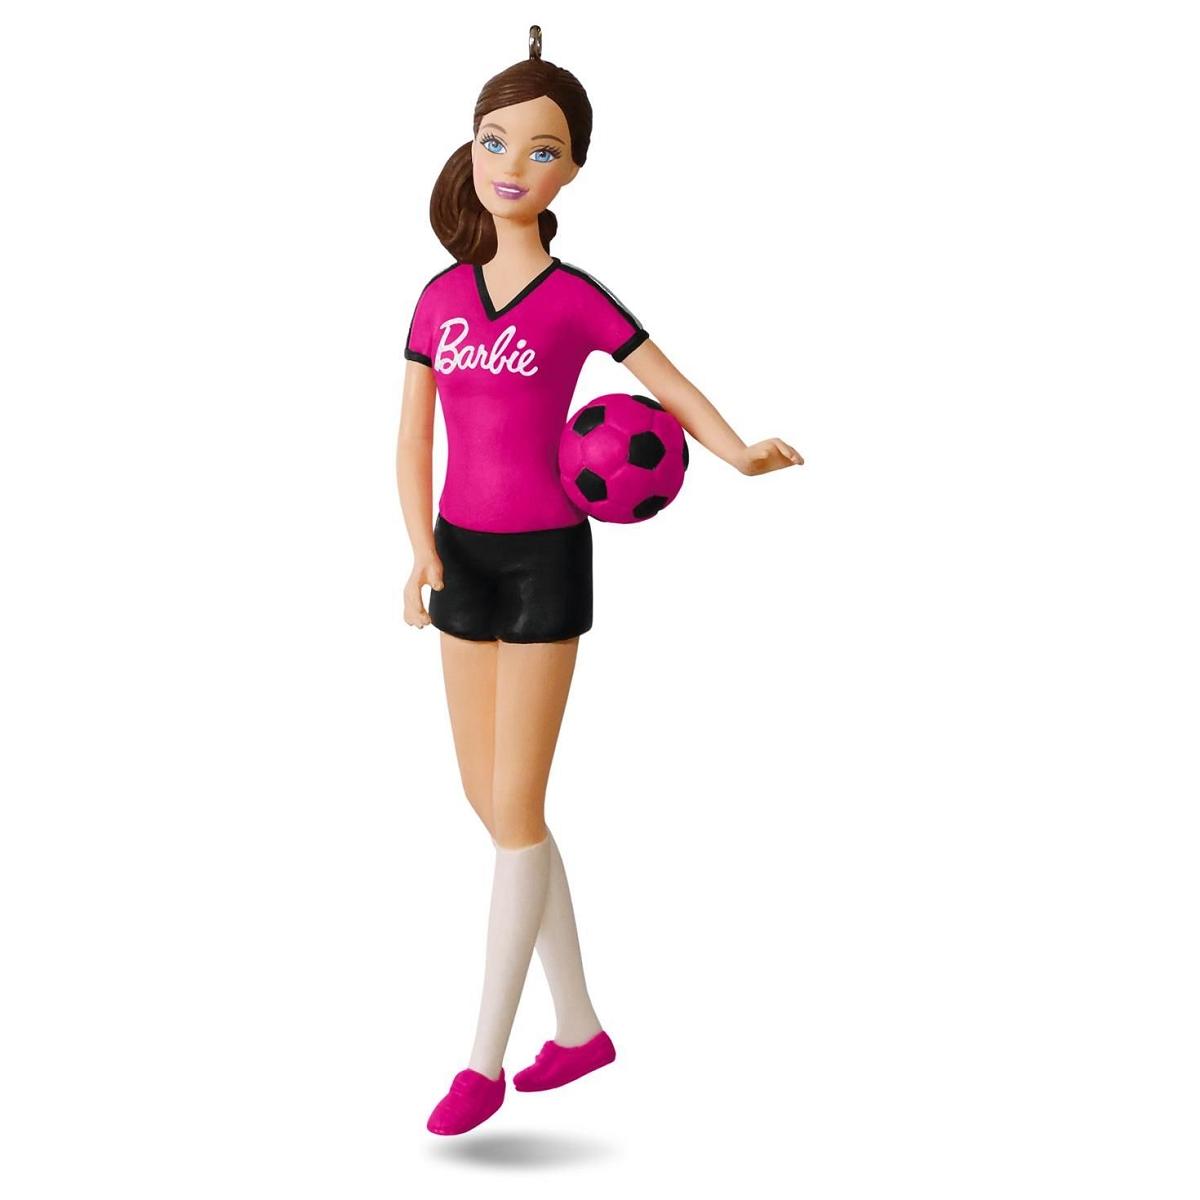 2016 Soccer Player Barbie Hallmark Keepsake Ornament